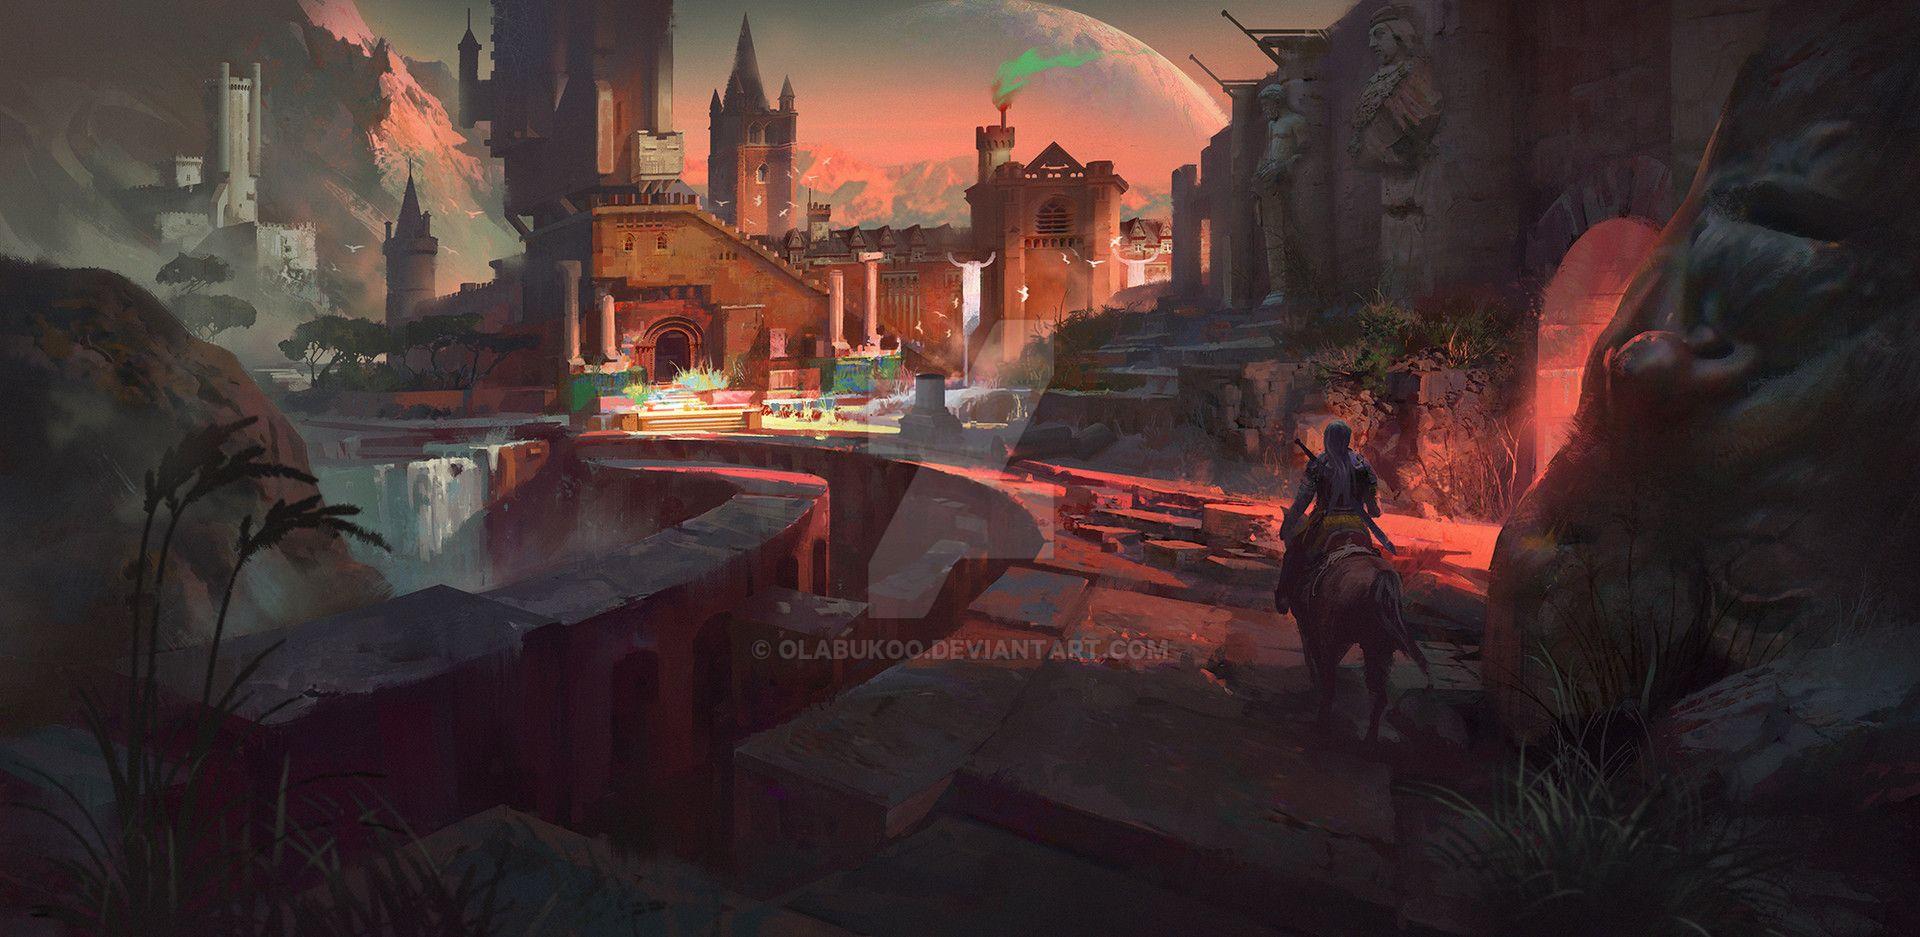 Secret Ruined Temple 02 by Olabukoo